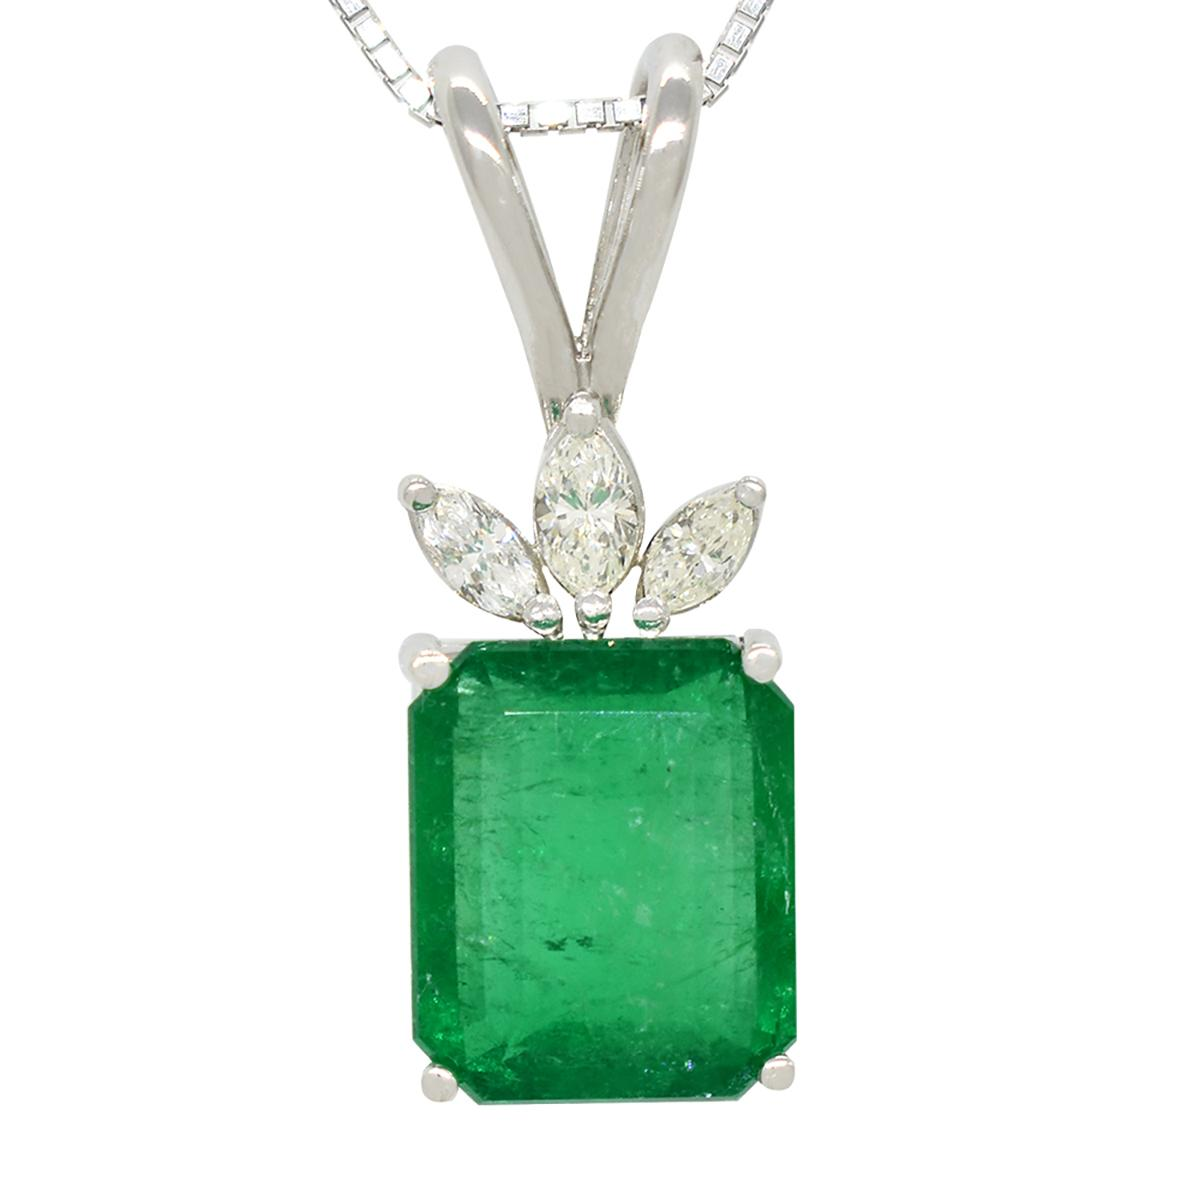 emerald-and-diamond-pendant-in-18k-white-gold-with-emerald-cut-emerald-and-marquise-shape-diamonds